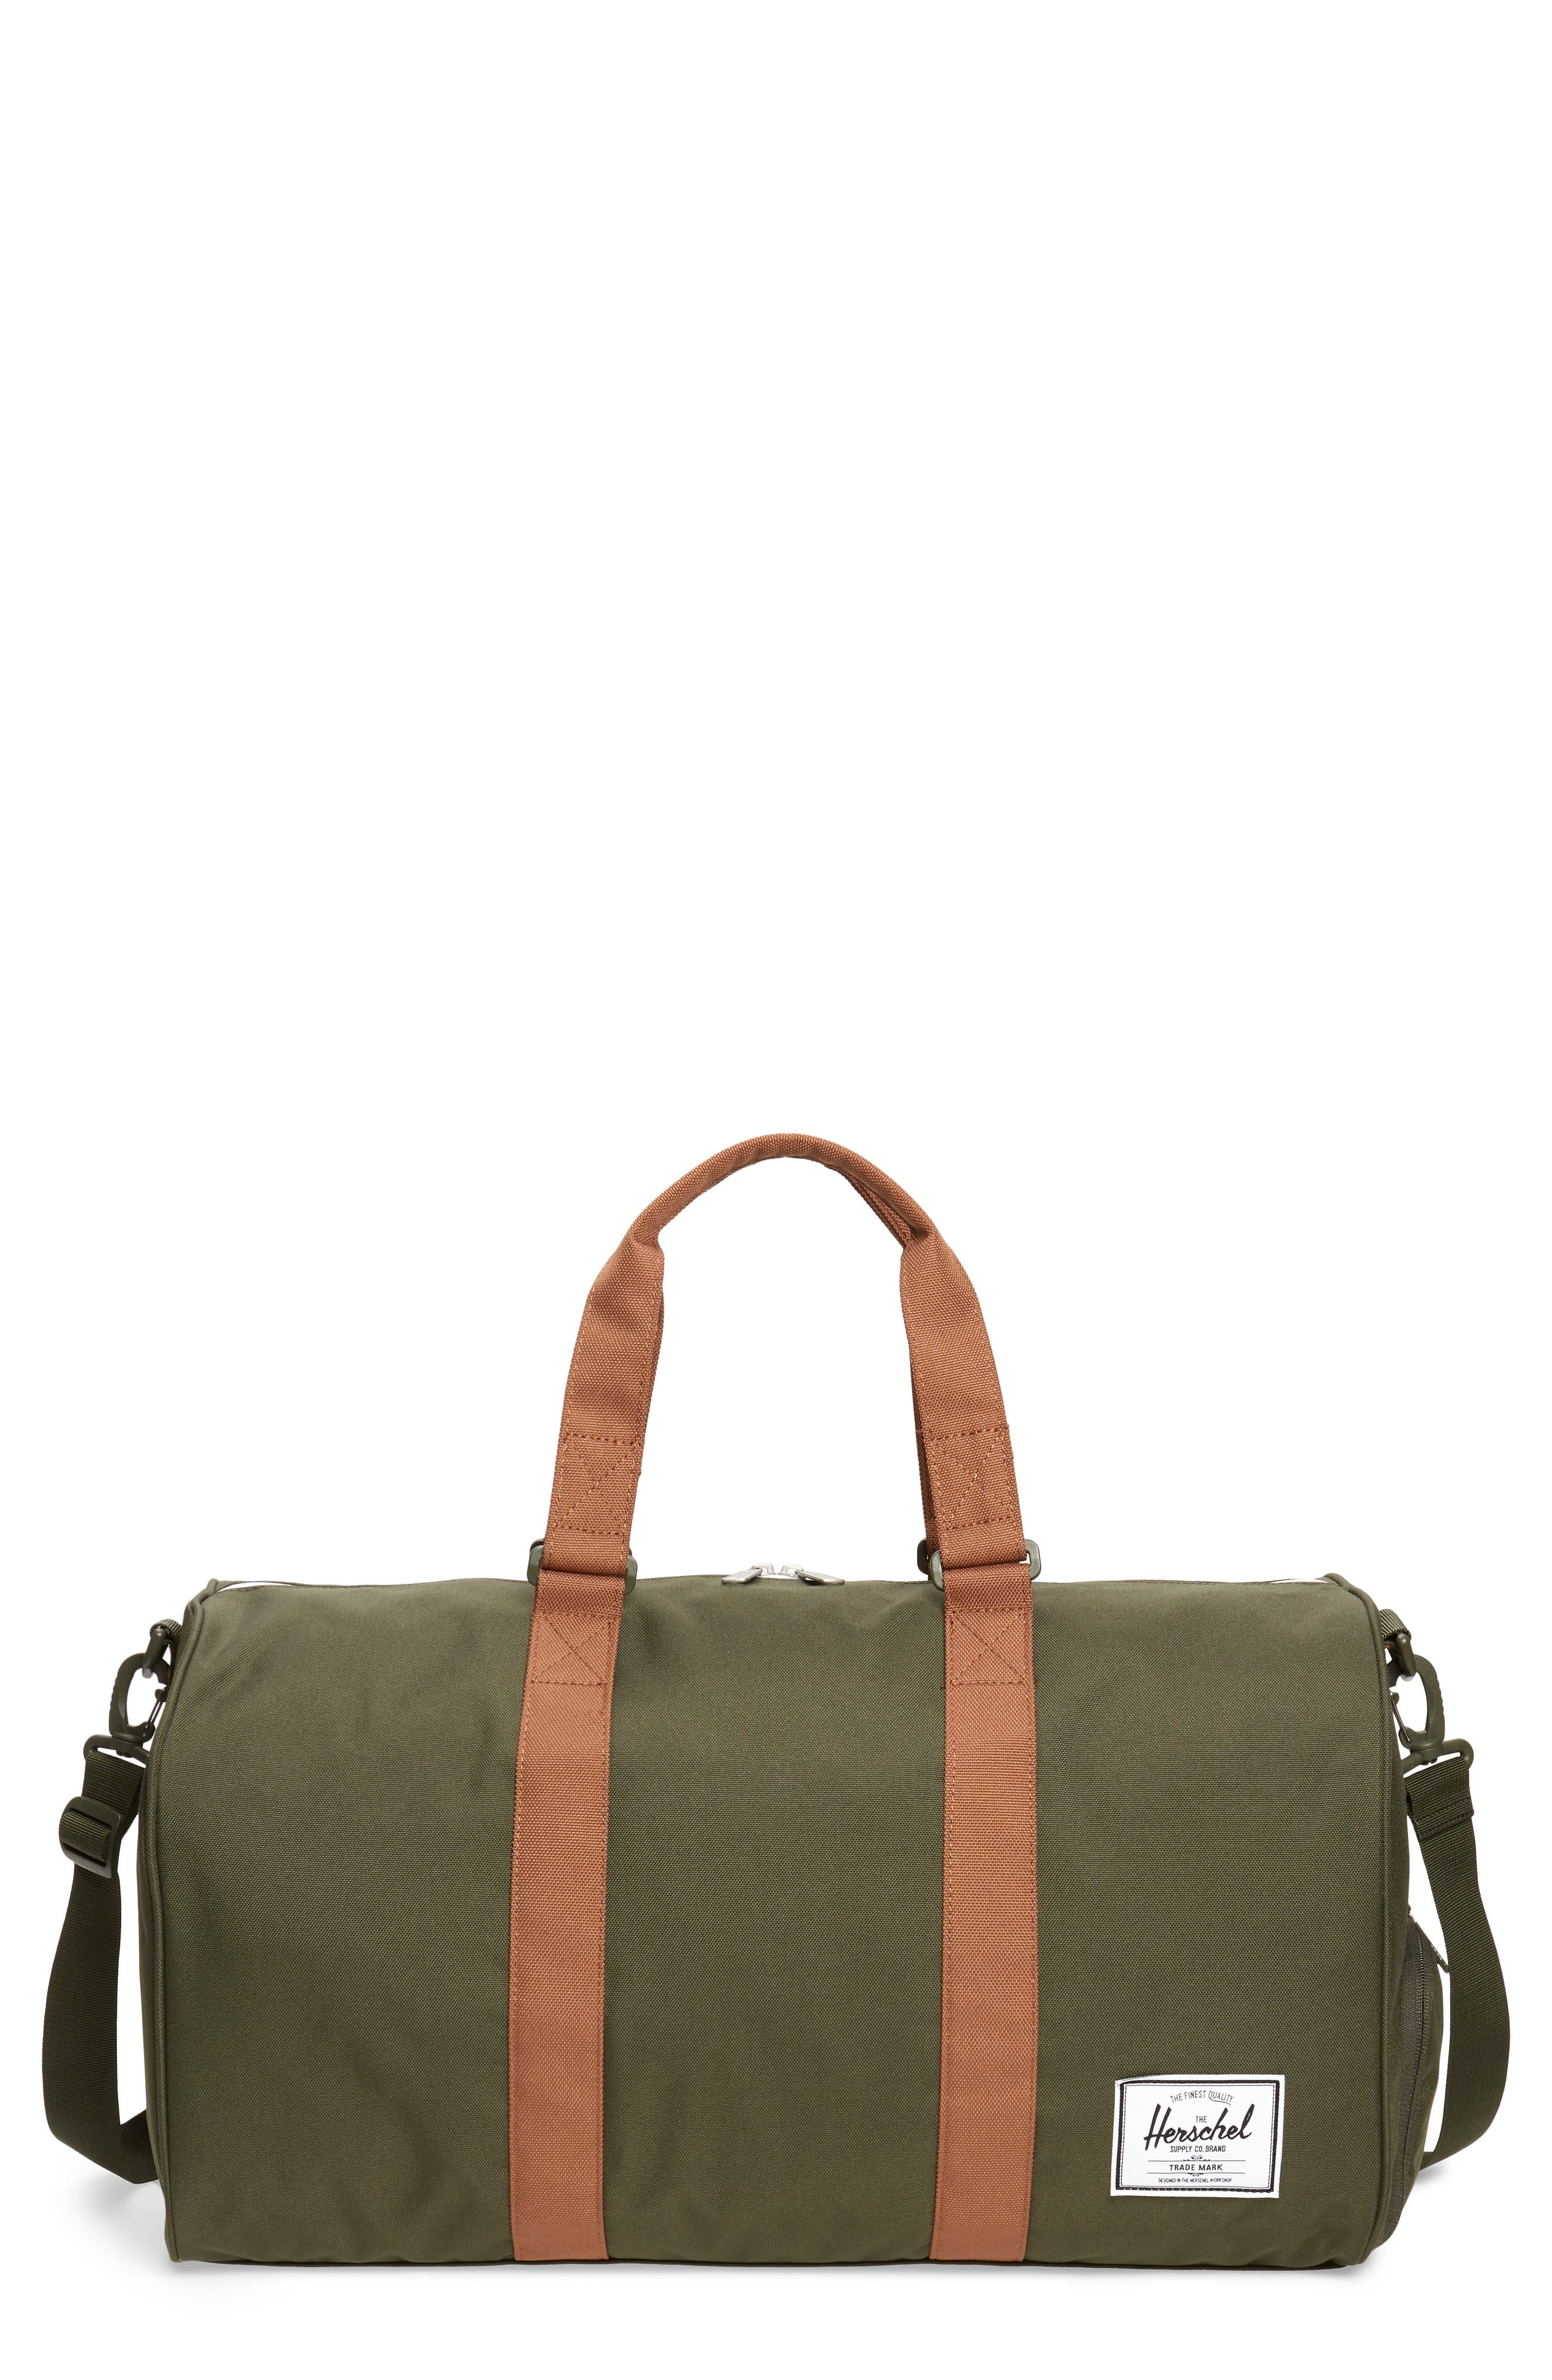 6ab46ddaa Herschel Supply Co. Handbags & Wallets for Women | Nordstrom